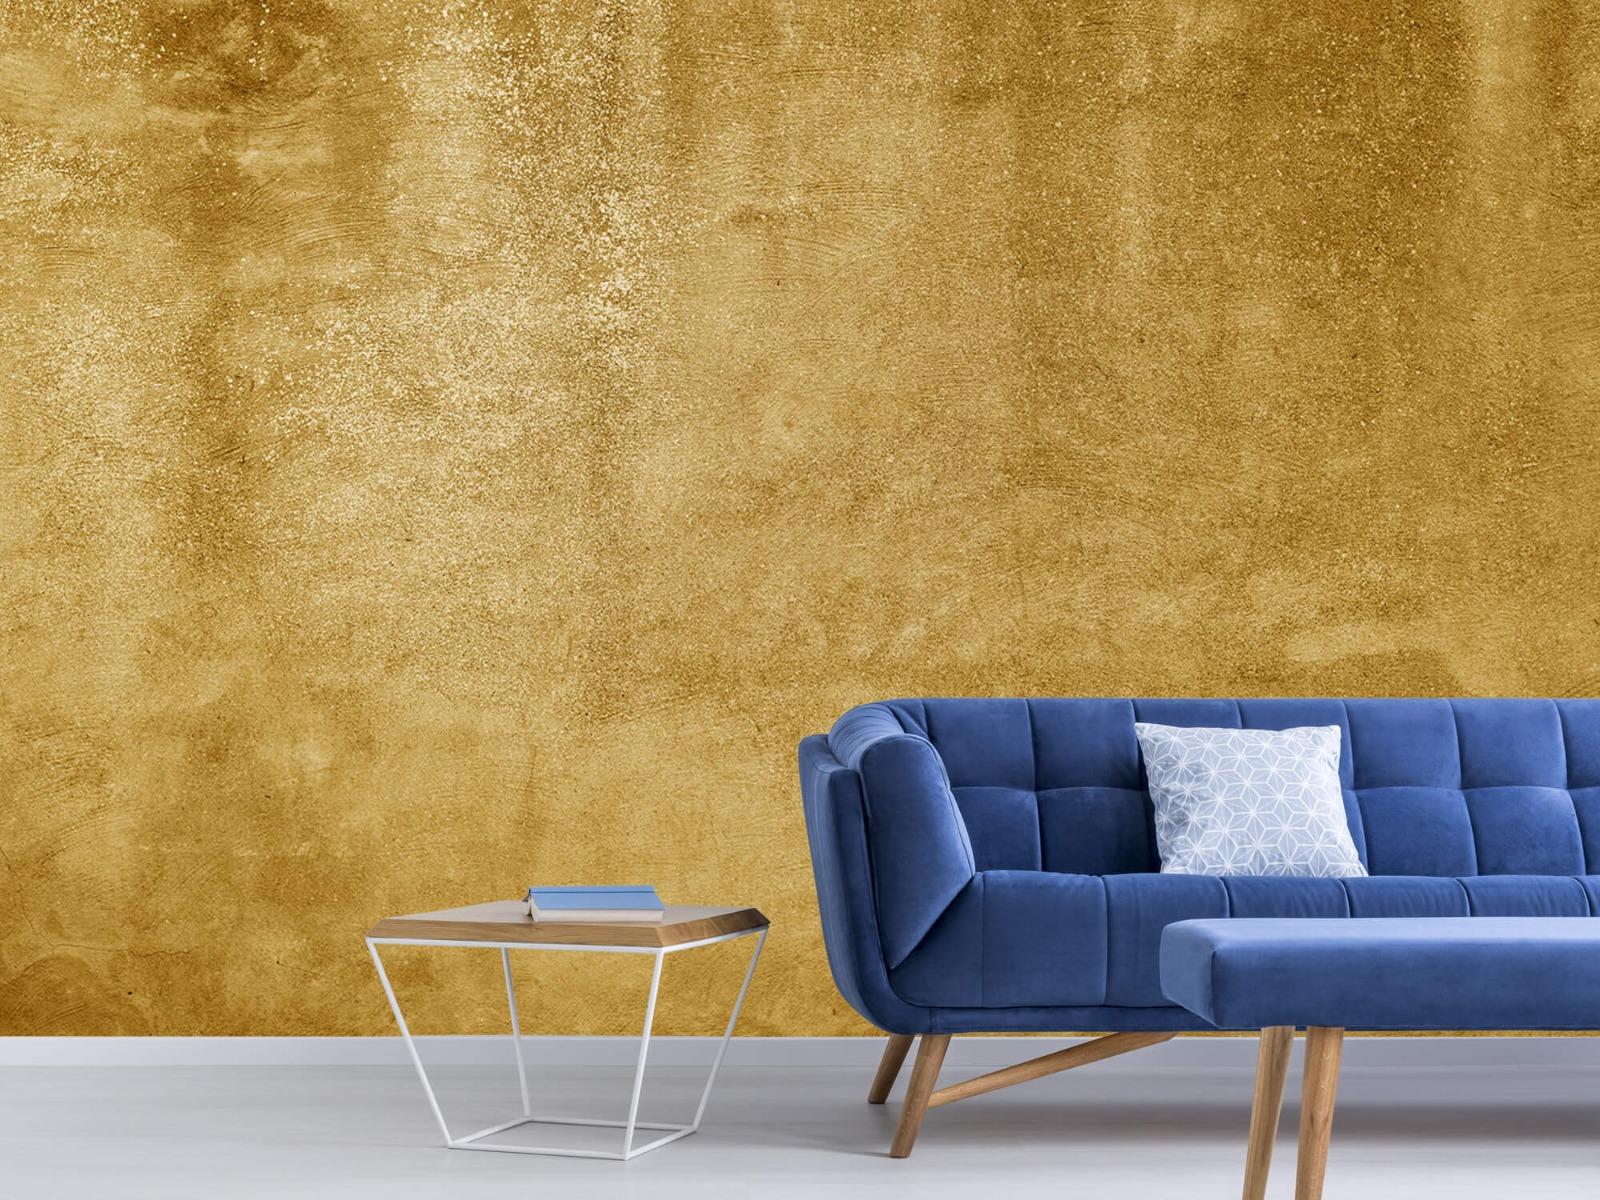 Betonlook behang - Oker geel beton - Woonkamer 6